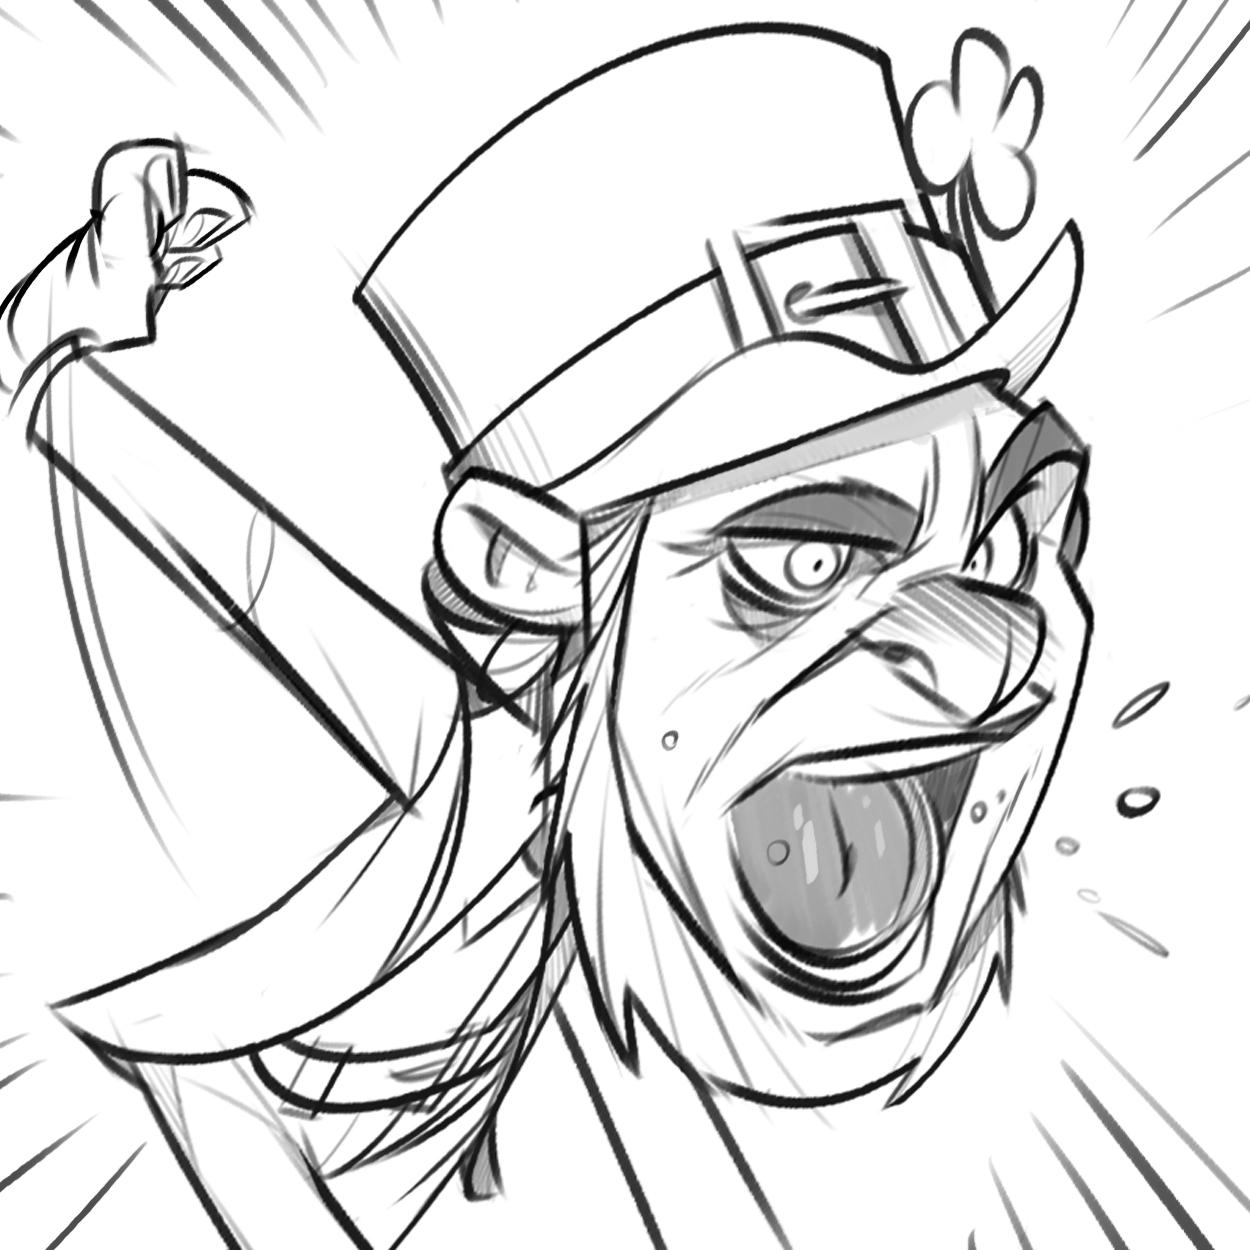 1250x1250 P.cohen Sketch Blog Angry Leprechaun